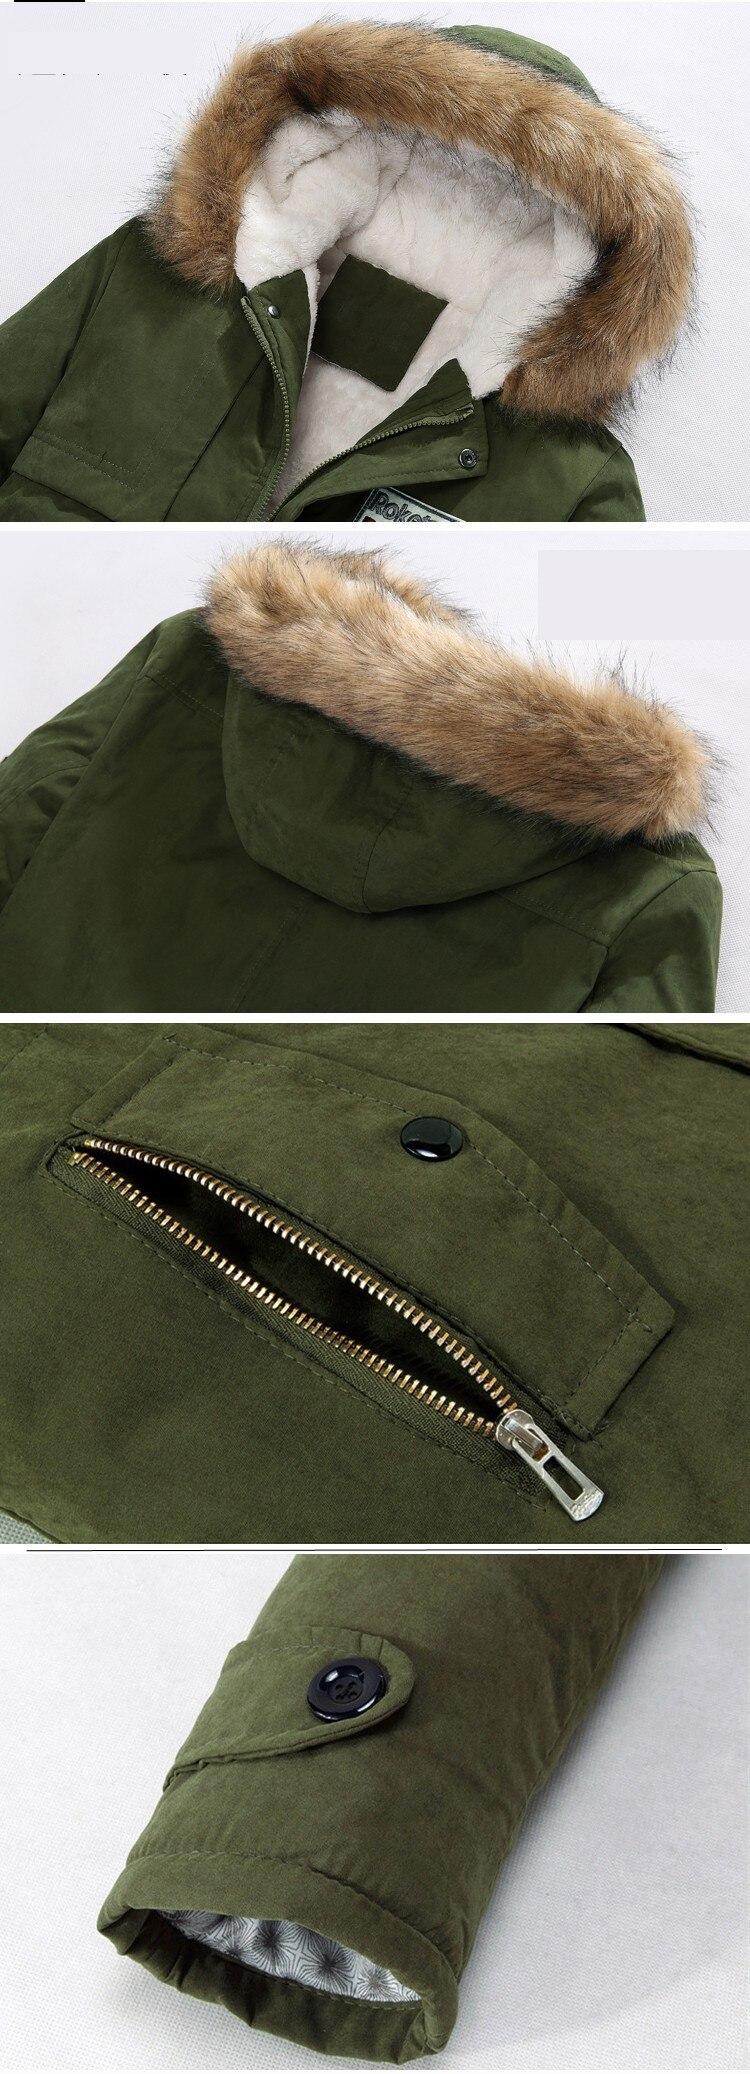 HTB1w08aeGmgSKJjSsphq6Ay1VXao jacket men 2019 new men's thick warm winter down coat long fur collar army green men parka Fleece cotton coat jacket parka men